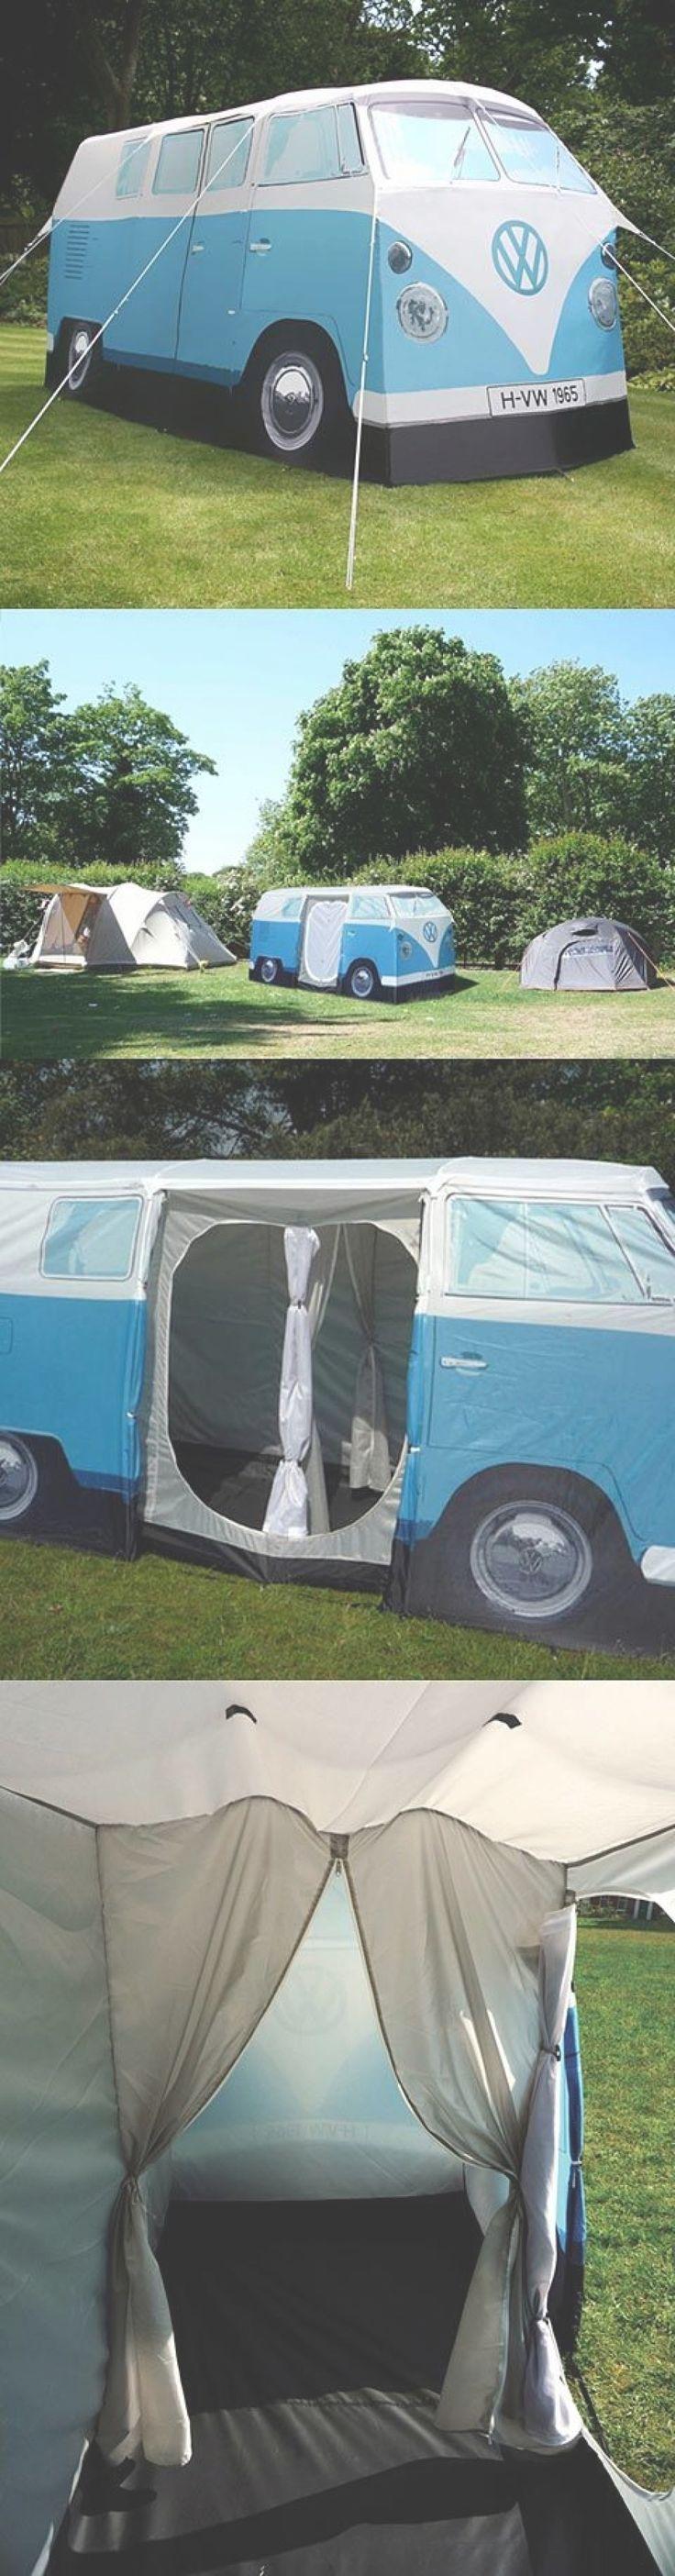 Van Camping Hacks Can Be Happy Campers http://zoladecor.com/van-camping-hacks-can-be-happy-campers